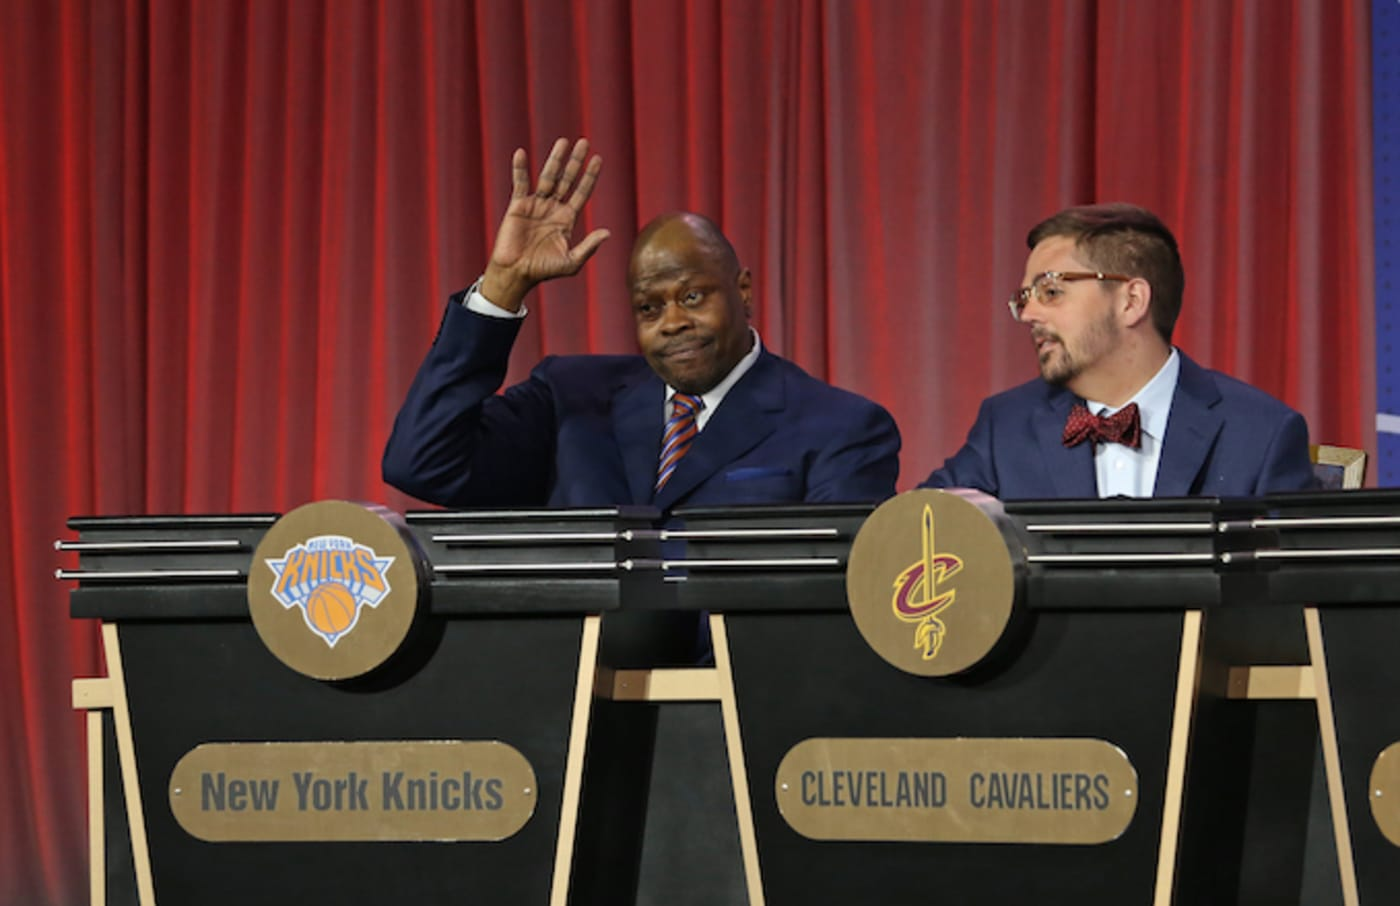 Patrick Ewing of the New York Knicks.